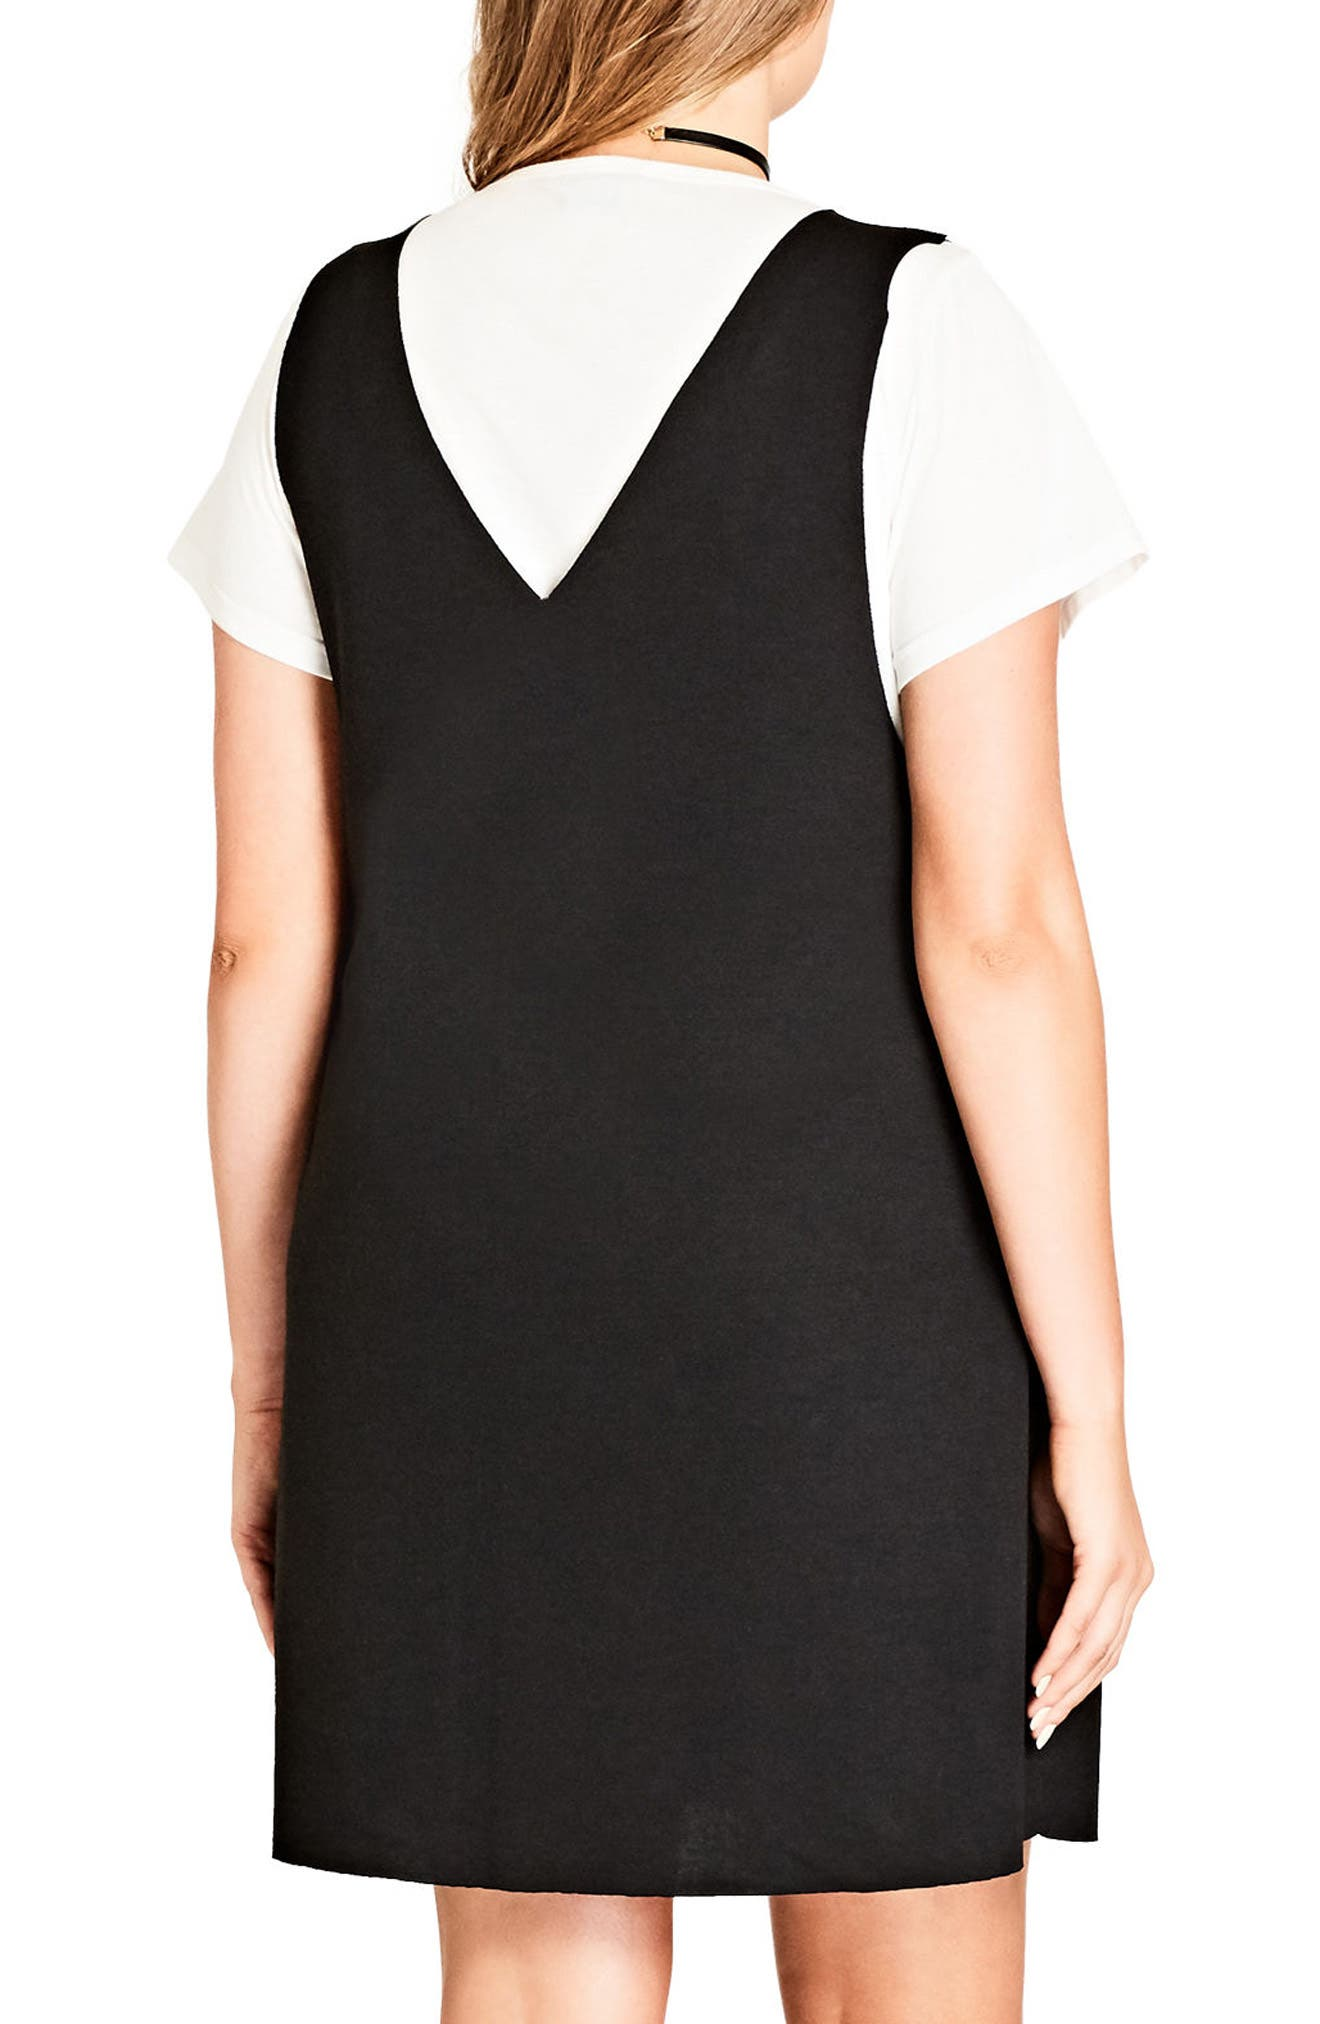 Alternate Image 2  - City Chic Grunge Girl Dress (Plus Size)